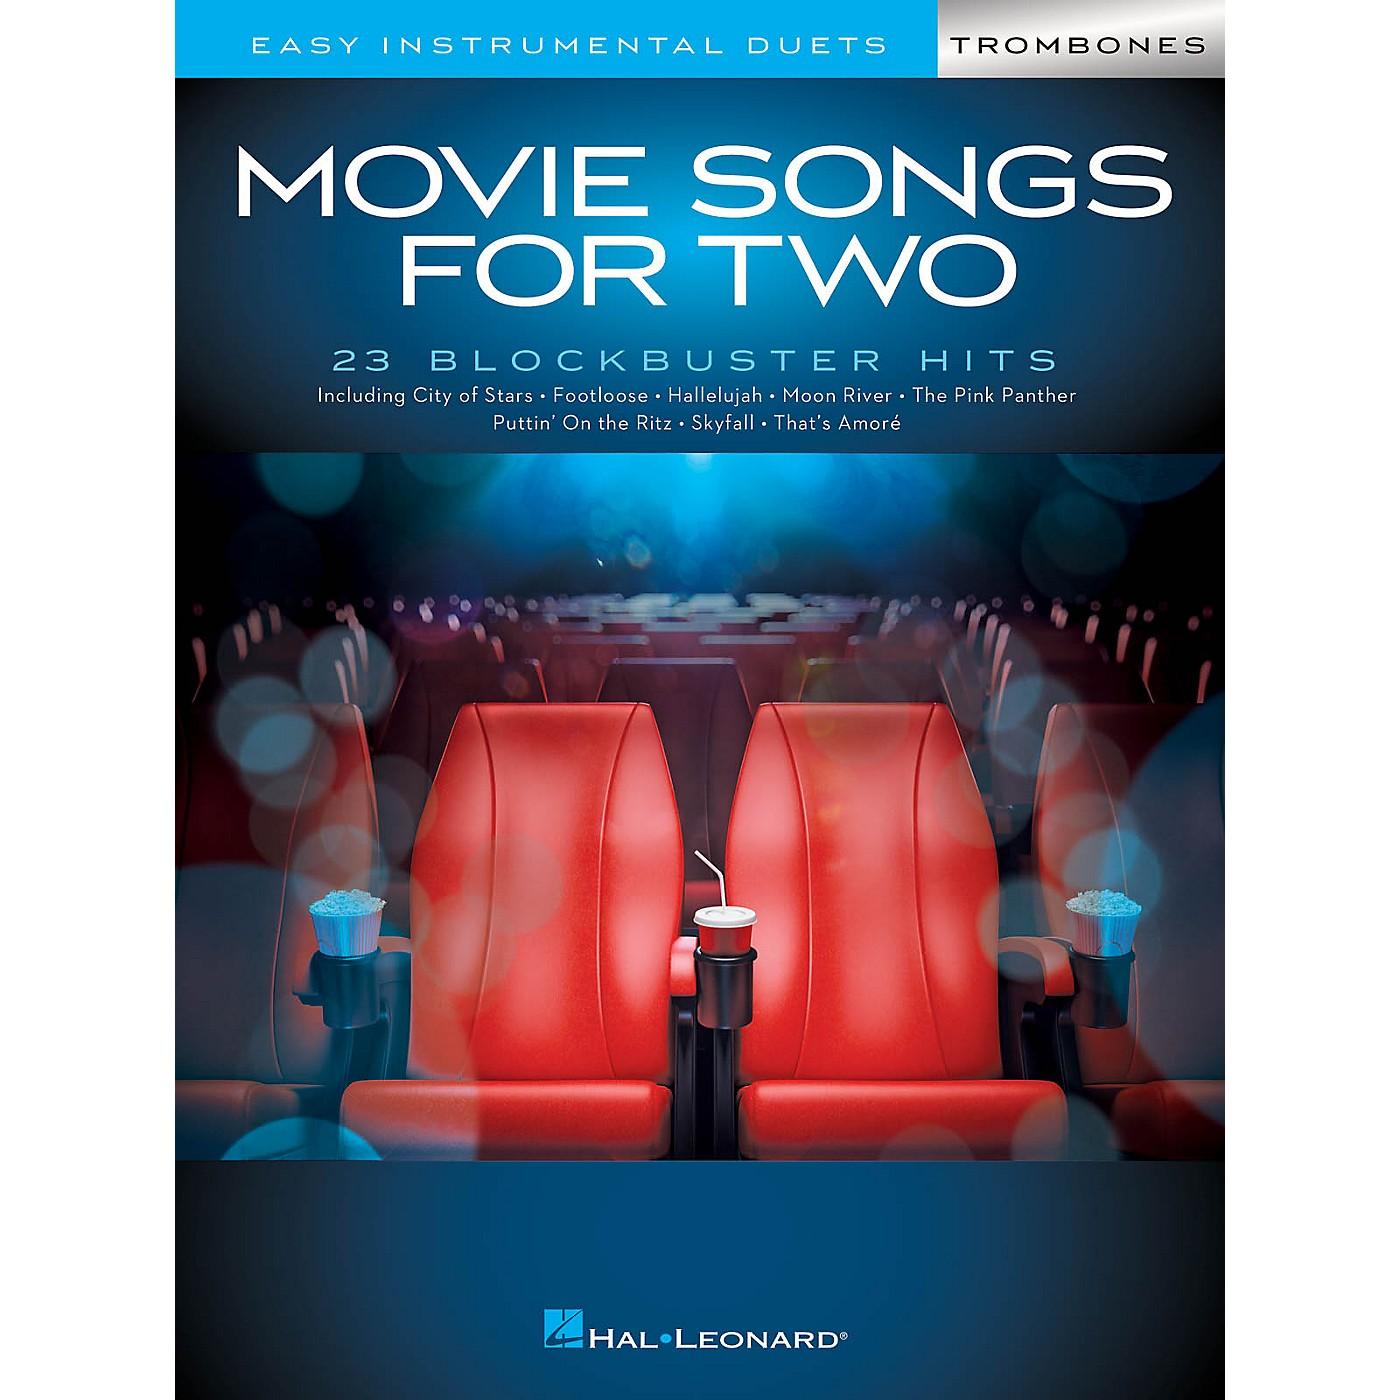 Hal Leonard Movie Songs for Two Trombones - Easy Instrumental Duets thumbnail